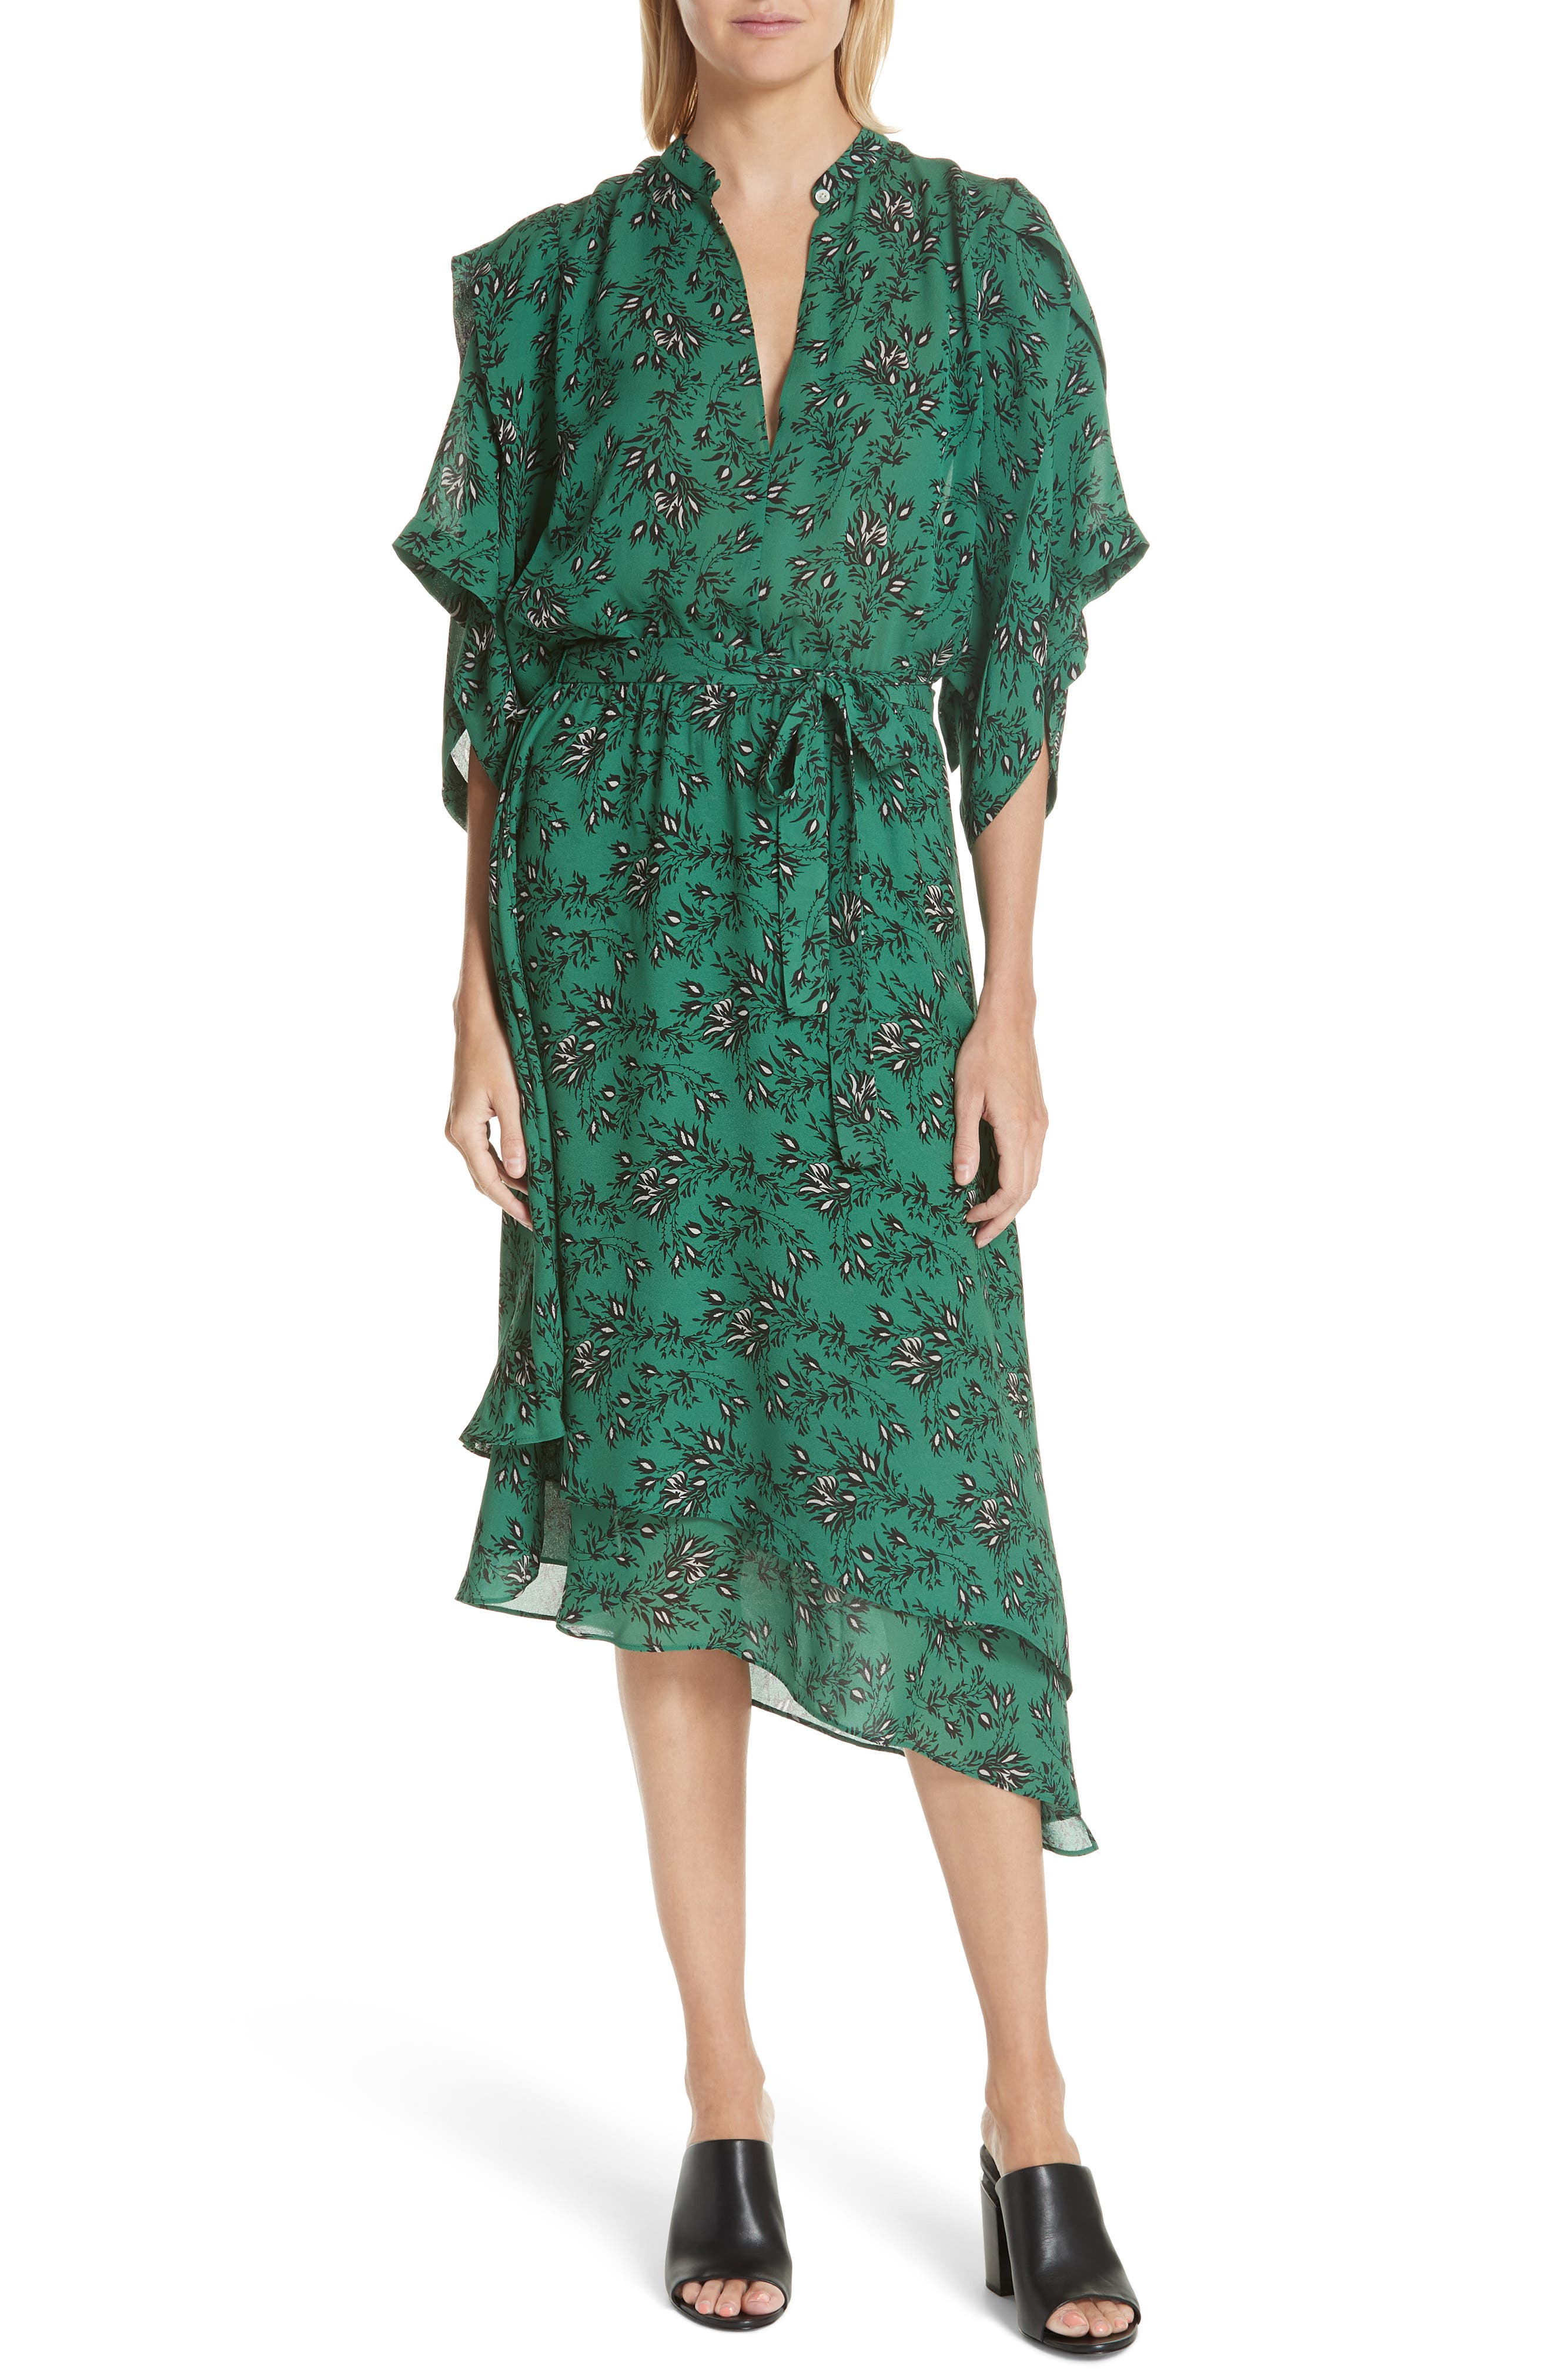 Japanese Floral Midi Dress,                             Main thumbnail 1, color,                             EMERALD ORCHID